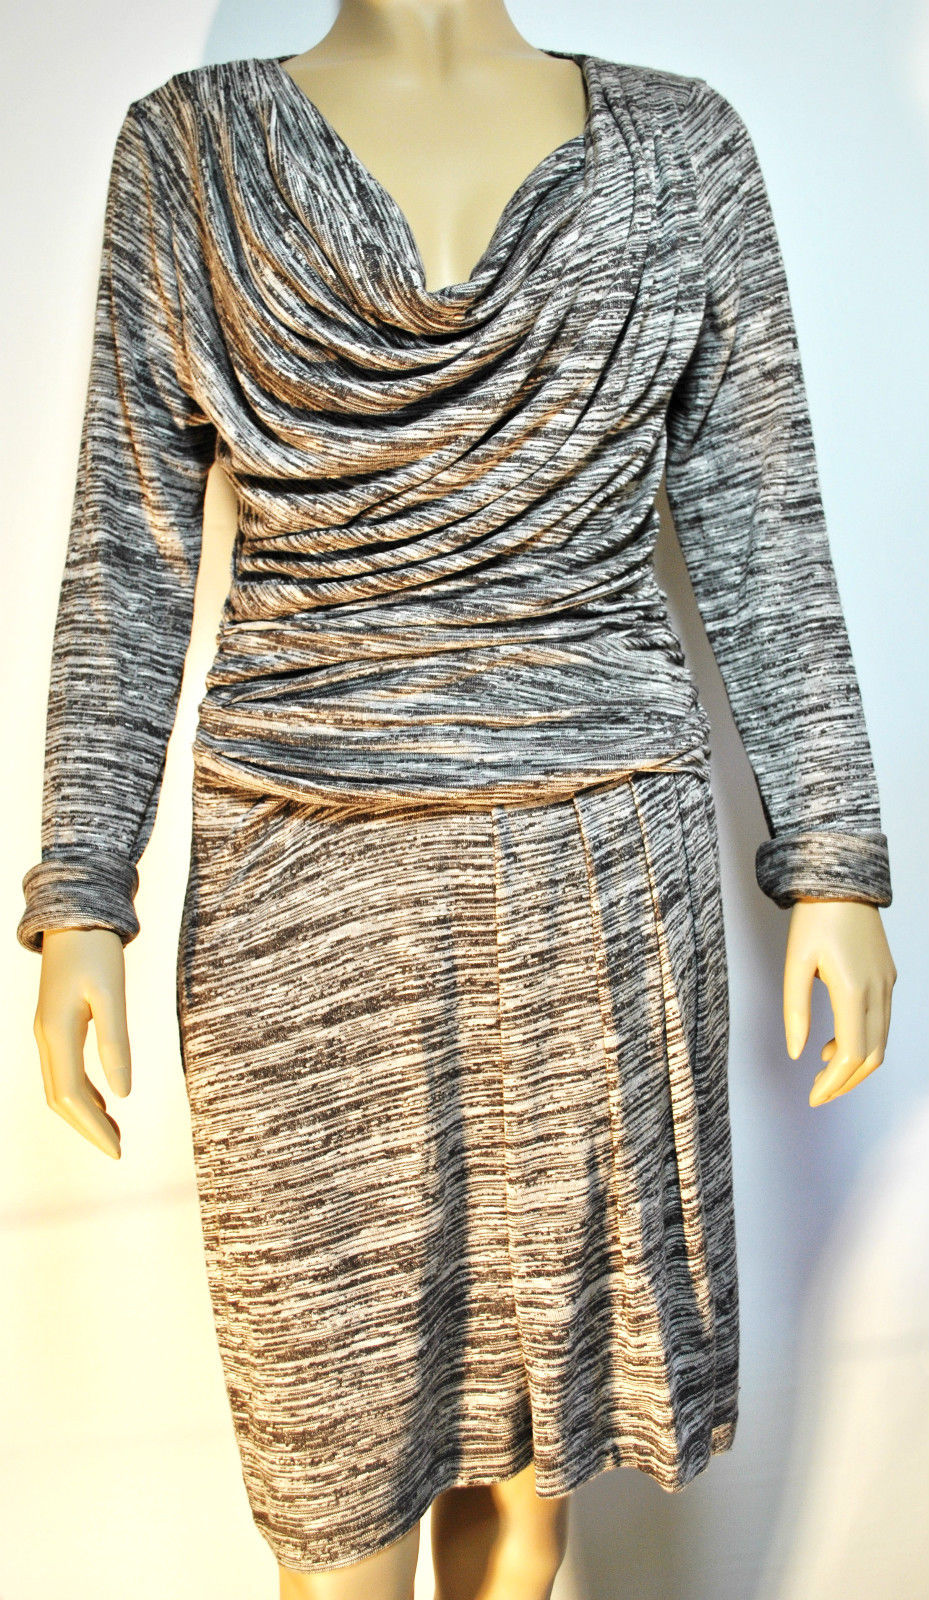 COWGIRL GLAM DRESS Grey & Black Draped Front Long Sleeve Designer Western Dress